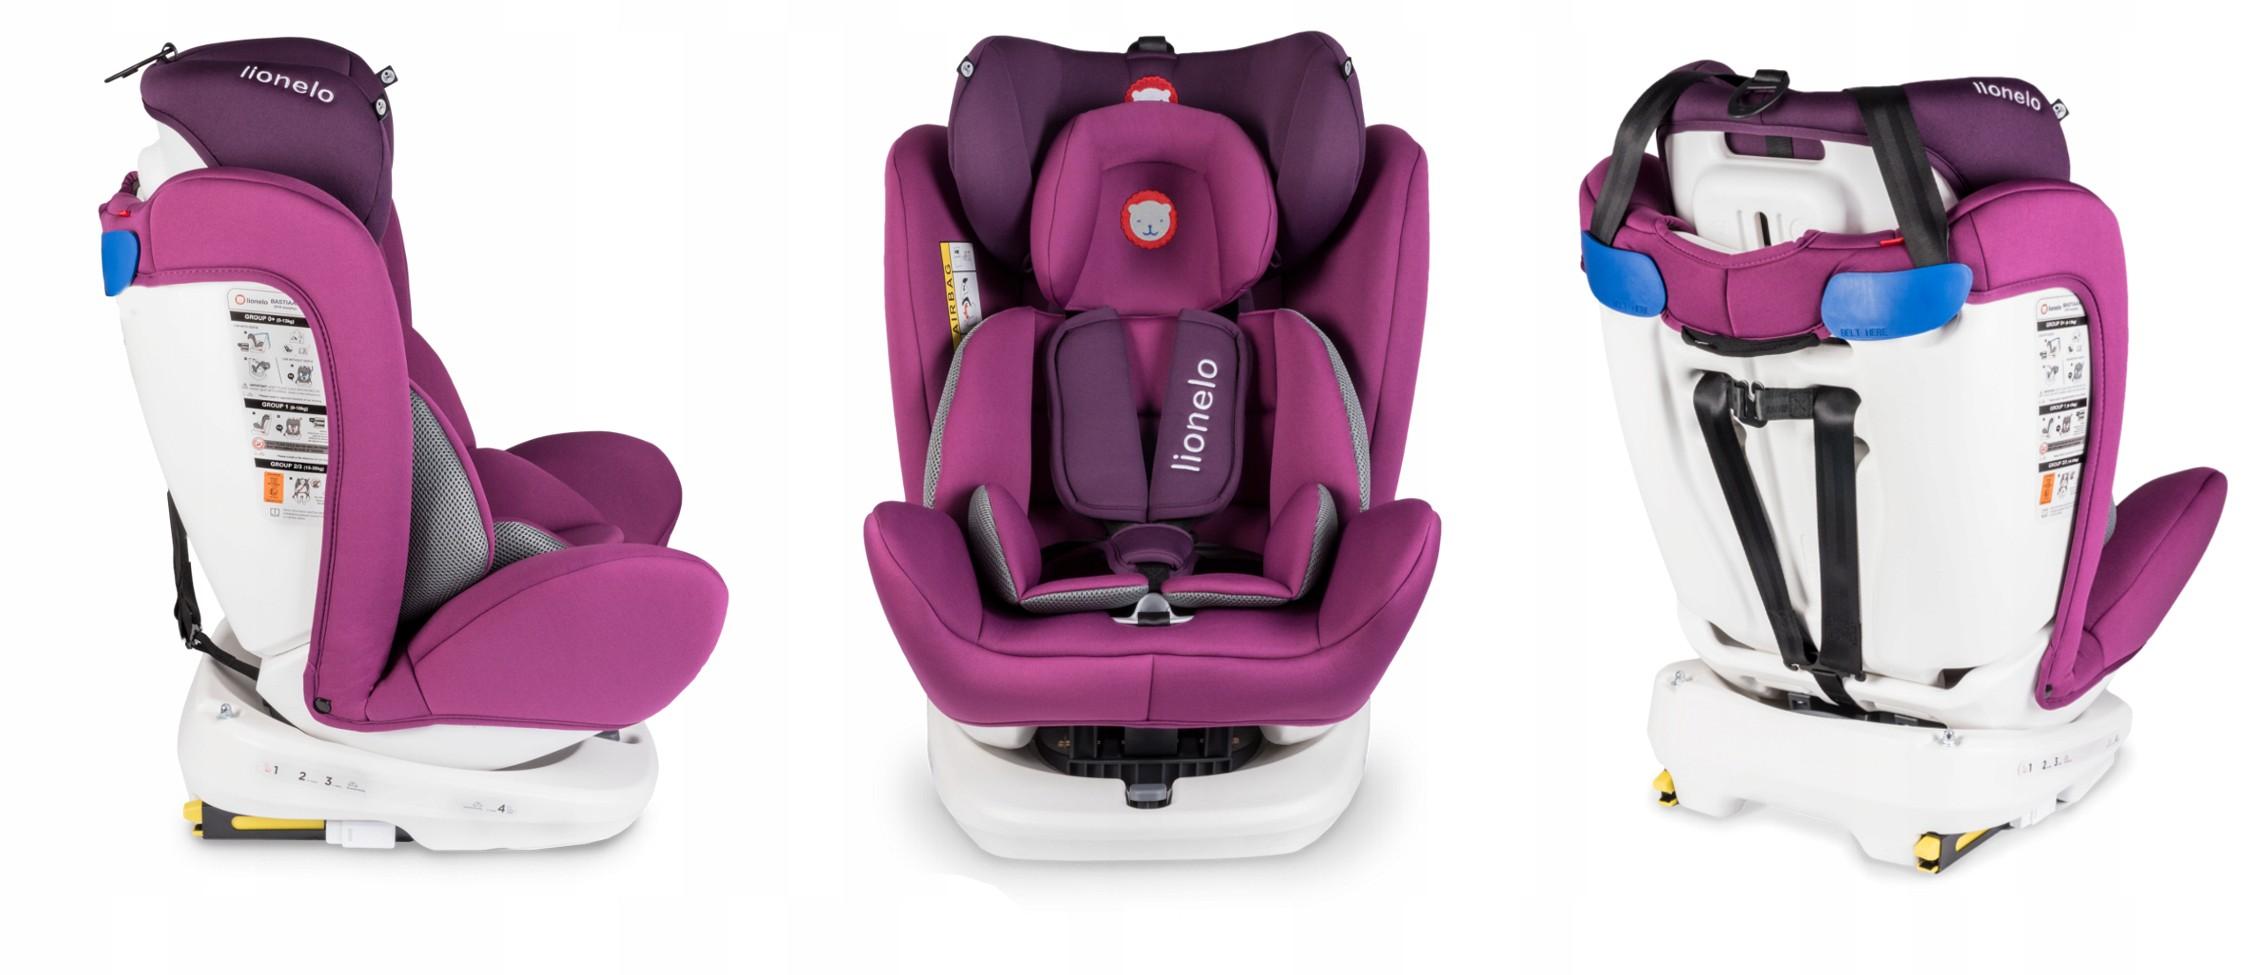 Lionelo-Bastiaan-360-Auto-Kindersitz-Autositz-ISOFIX-9-36Kg-Gruppe-0-1-2-3-TUV Indexbild 29